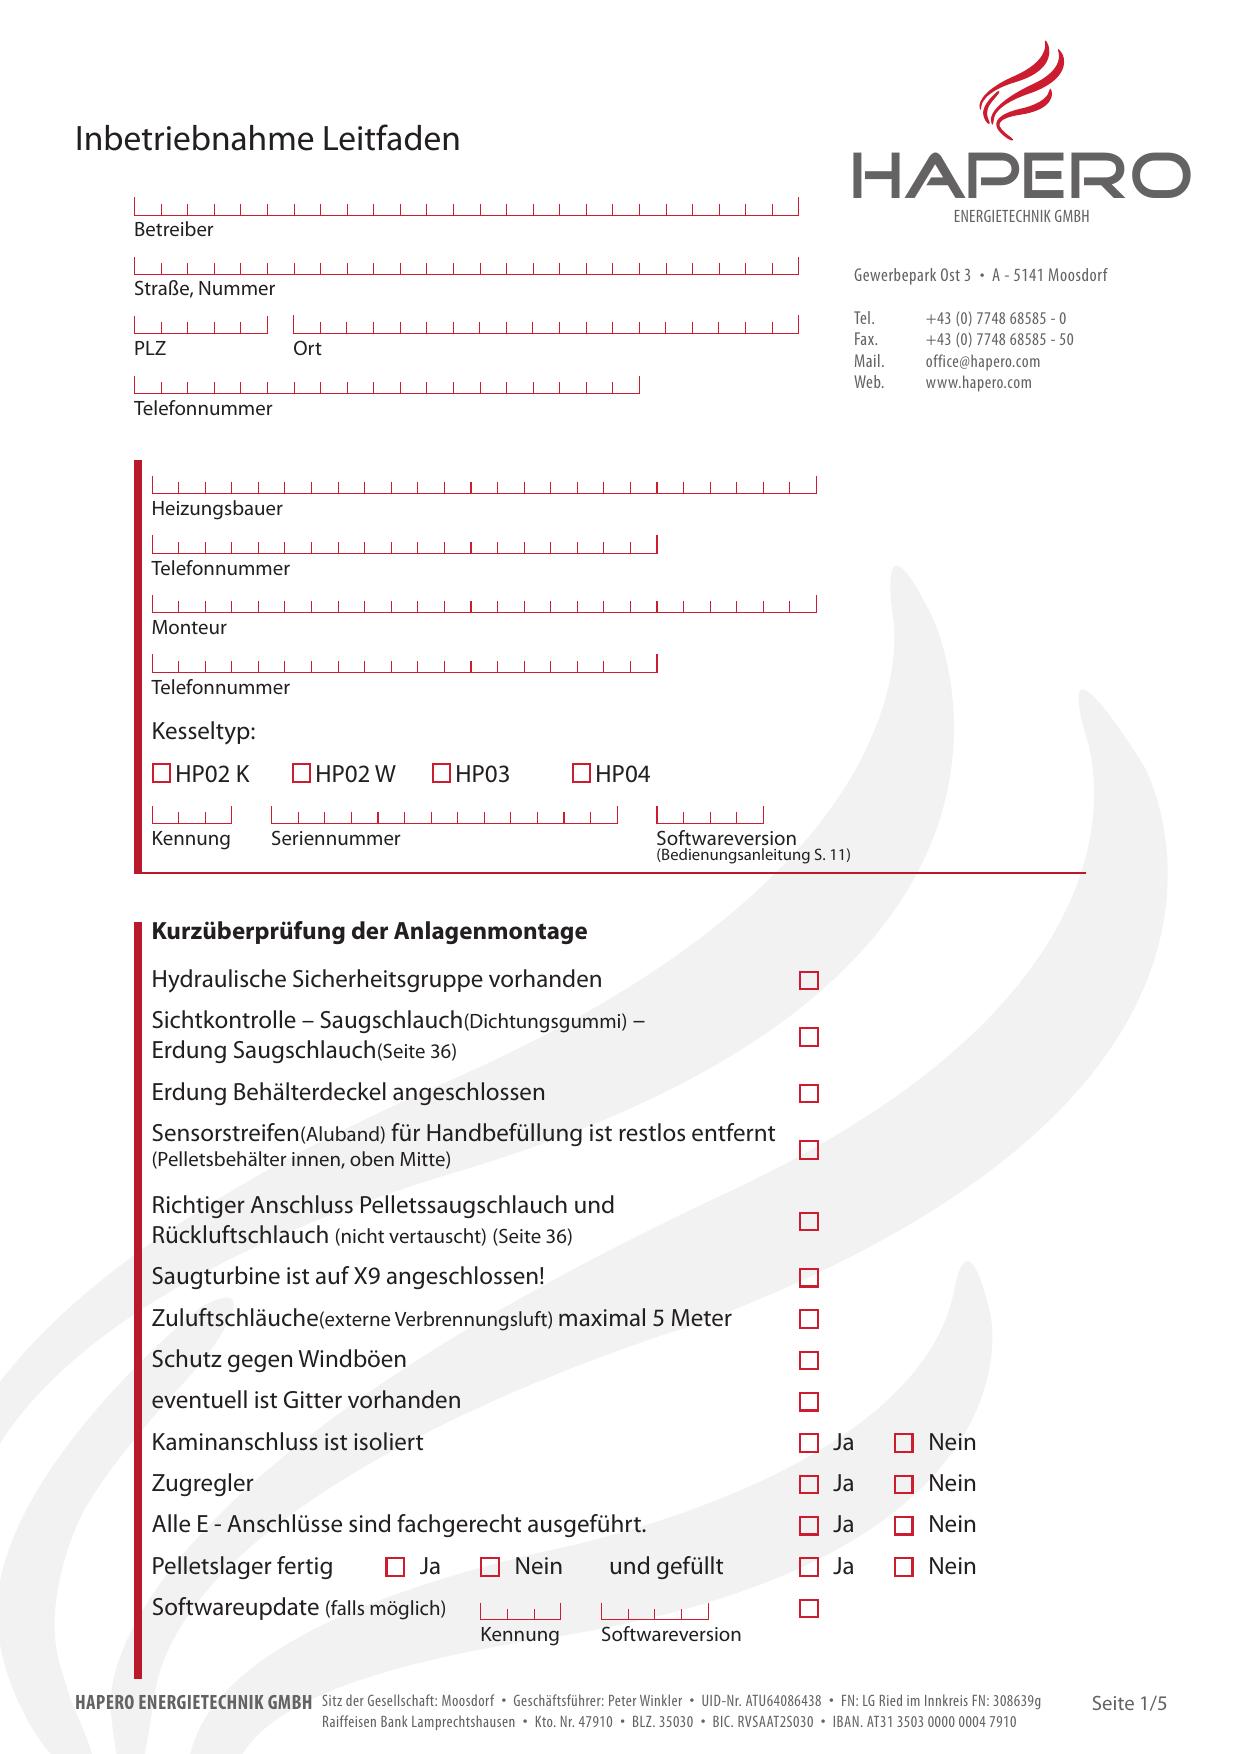 Atemberaubend Kesseltypen Ideen - Der Schaltplan - greigo.com